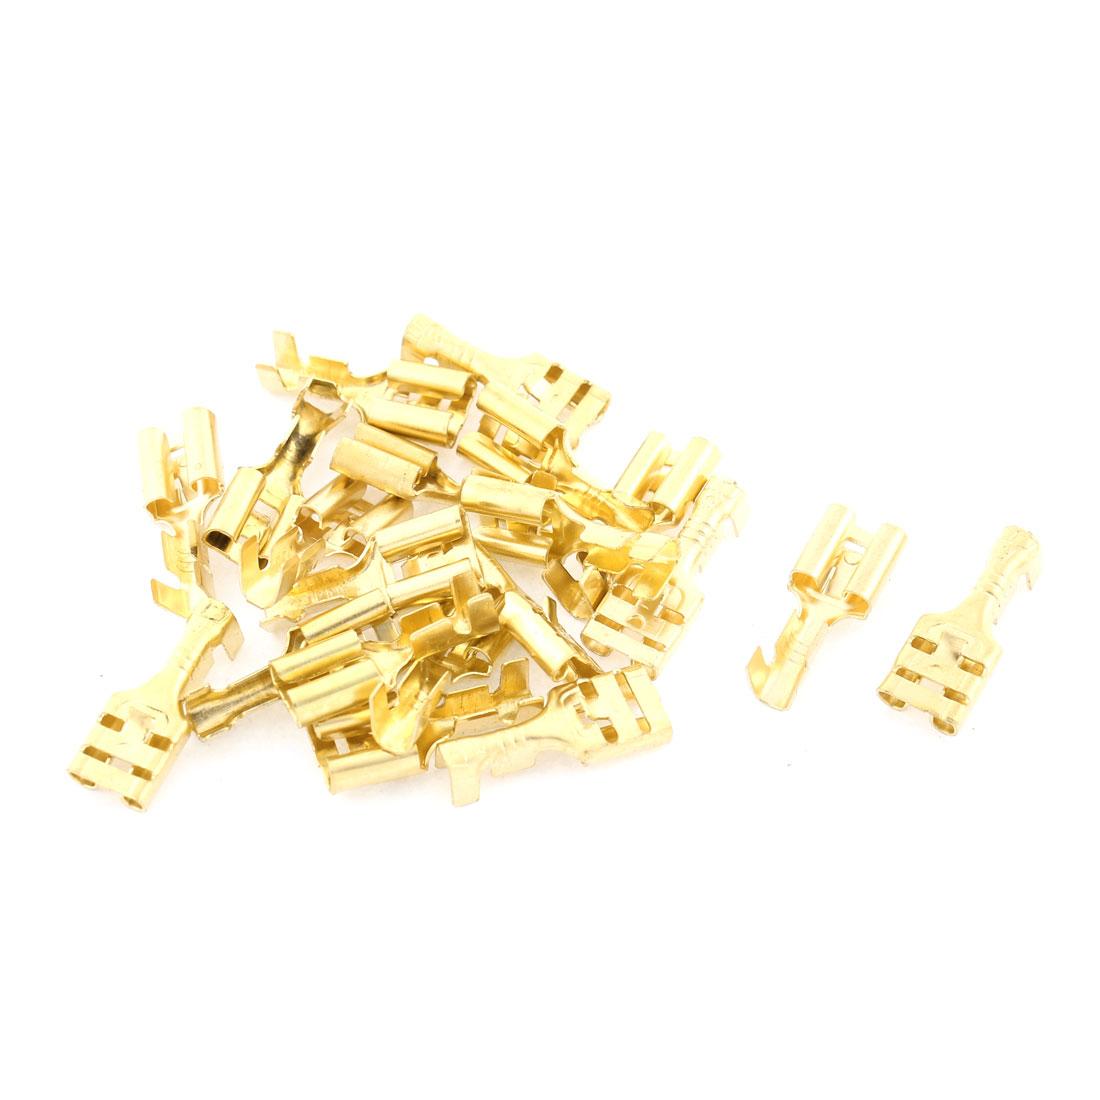 20 Pcs 6.3mm Stud Brass Female Cable Crimp Terminal Connector